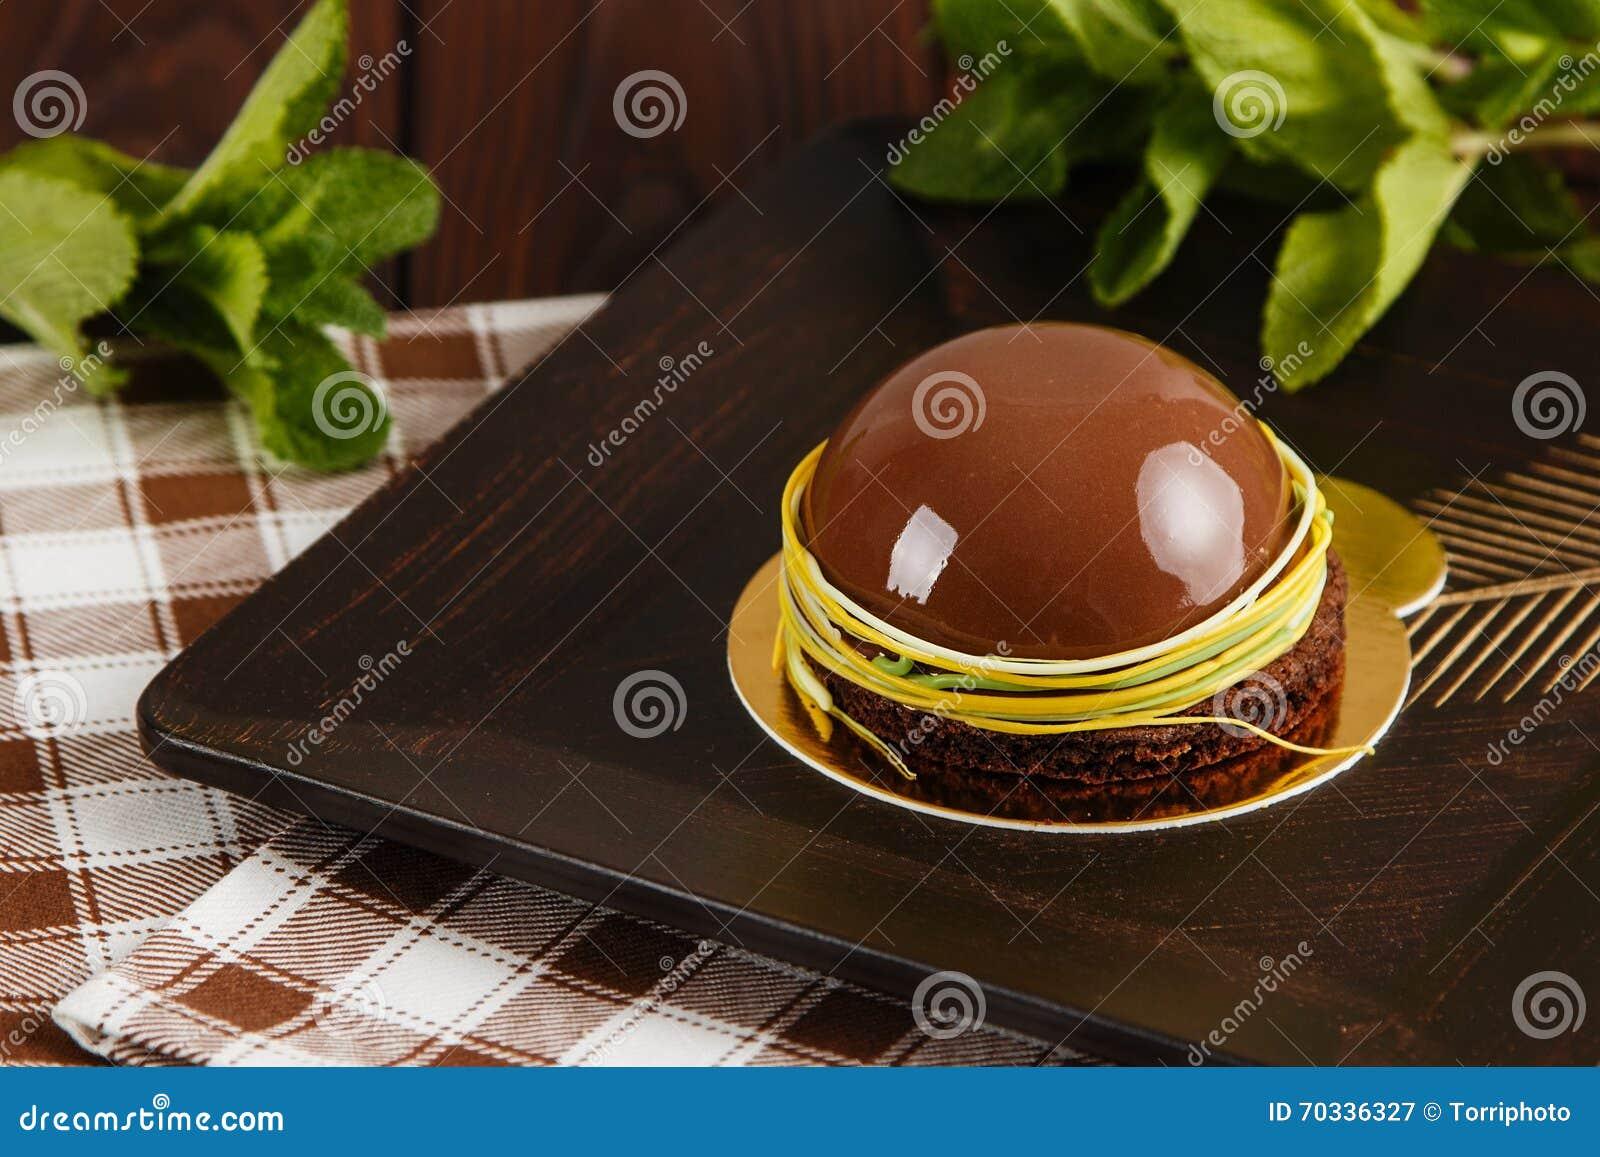 European Chocolate Cake